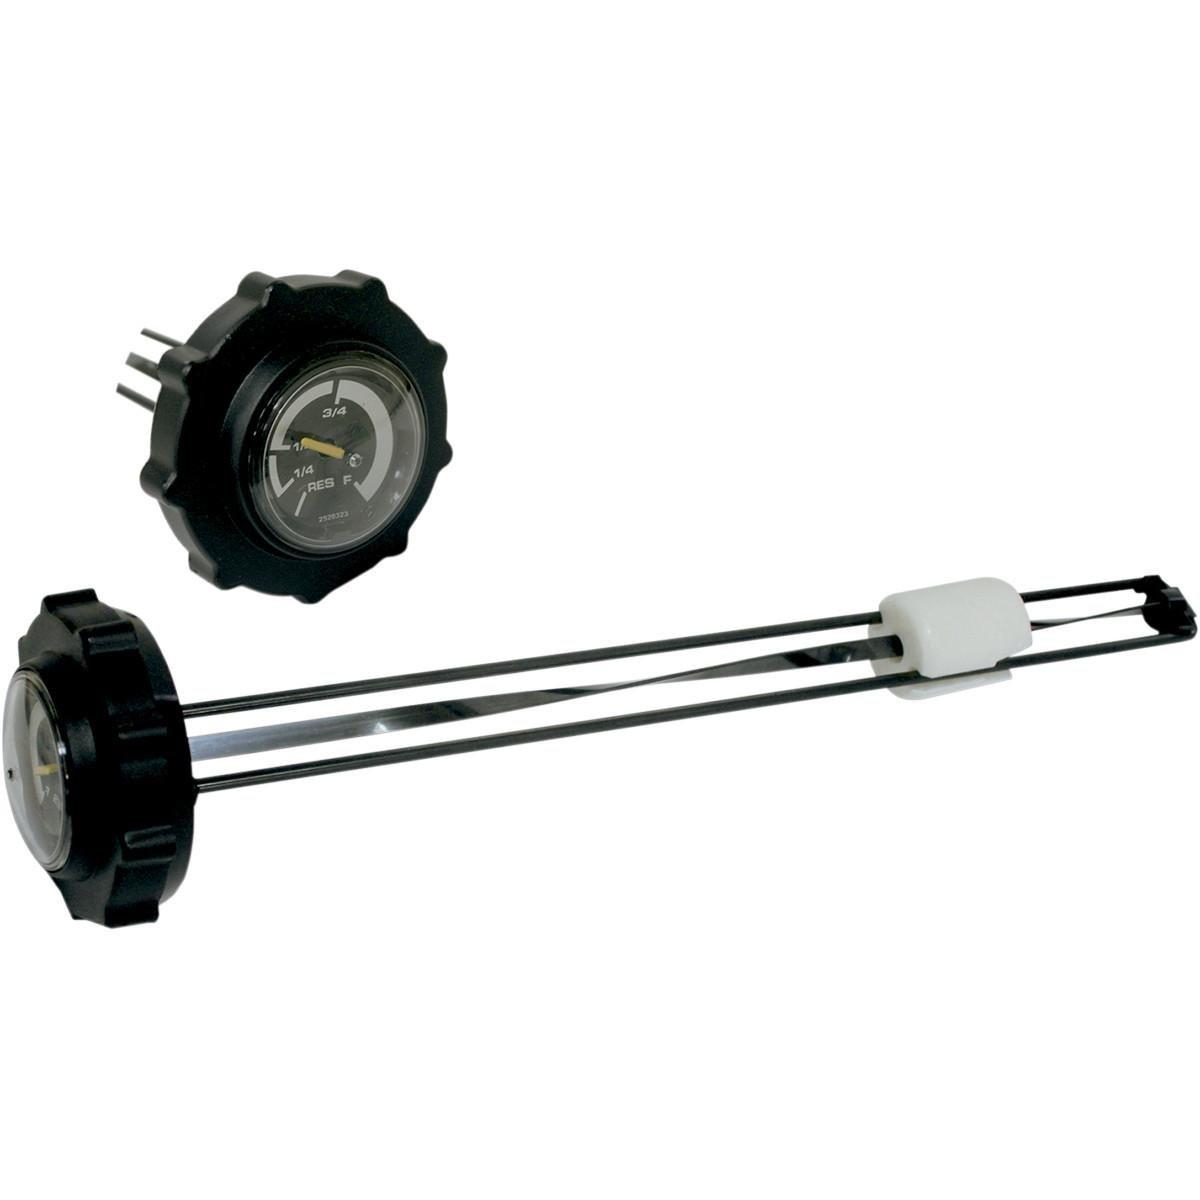 EPI Non-Vented Gas Cap with Gauge (Kelch Style) EPIGC5 0703-0386